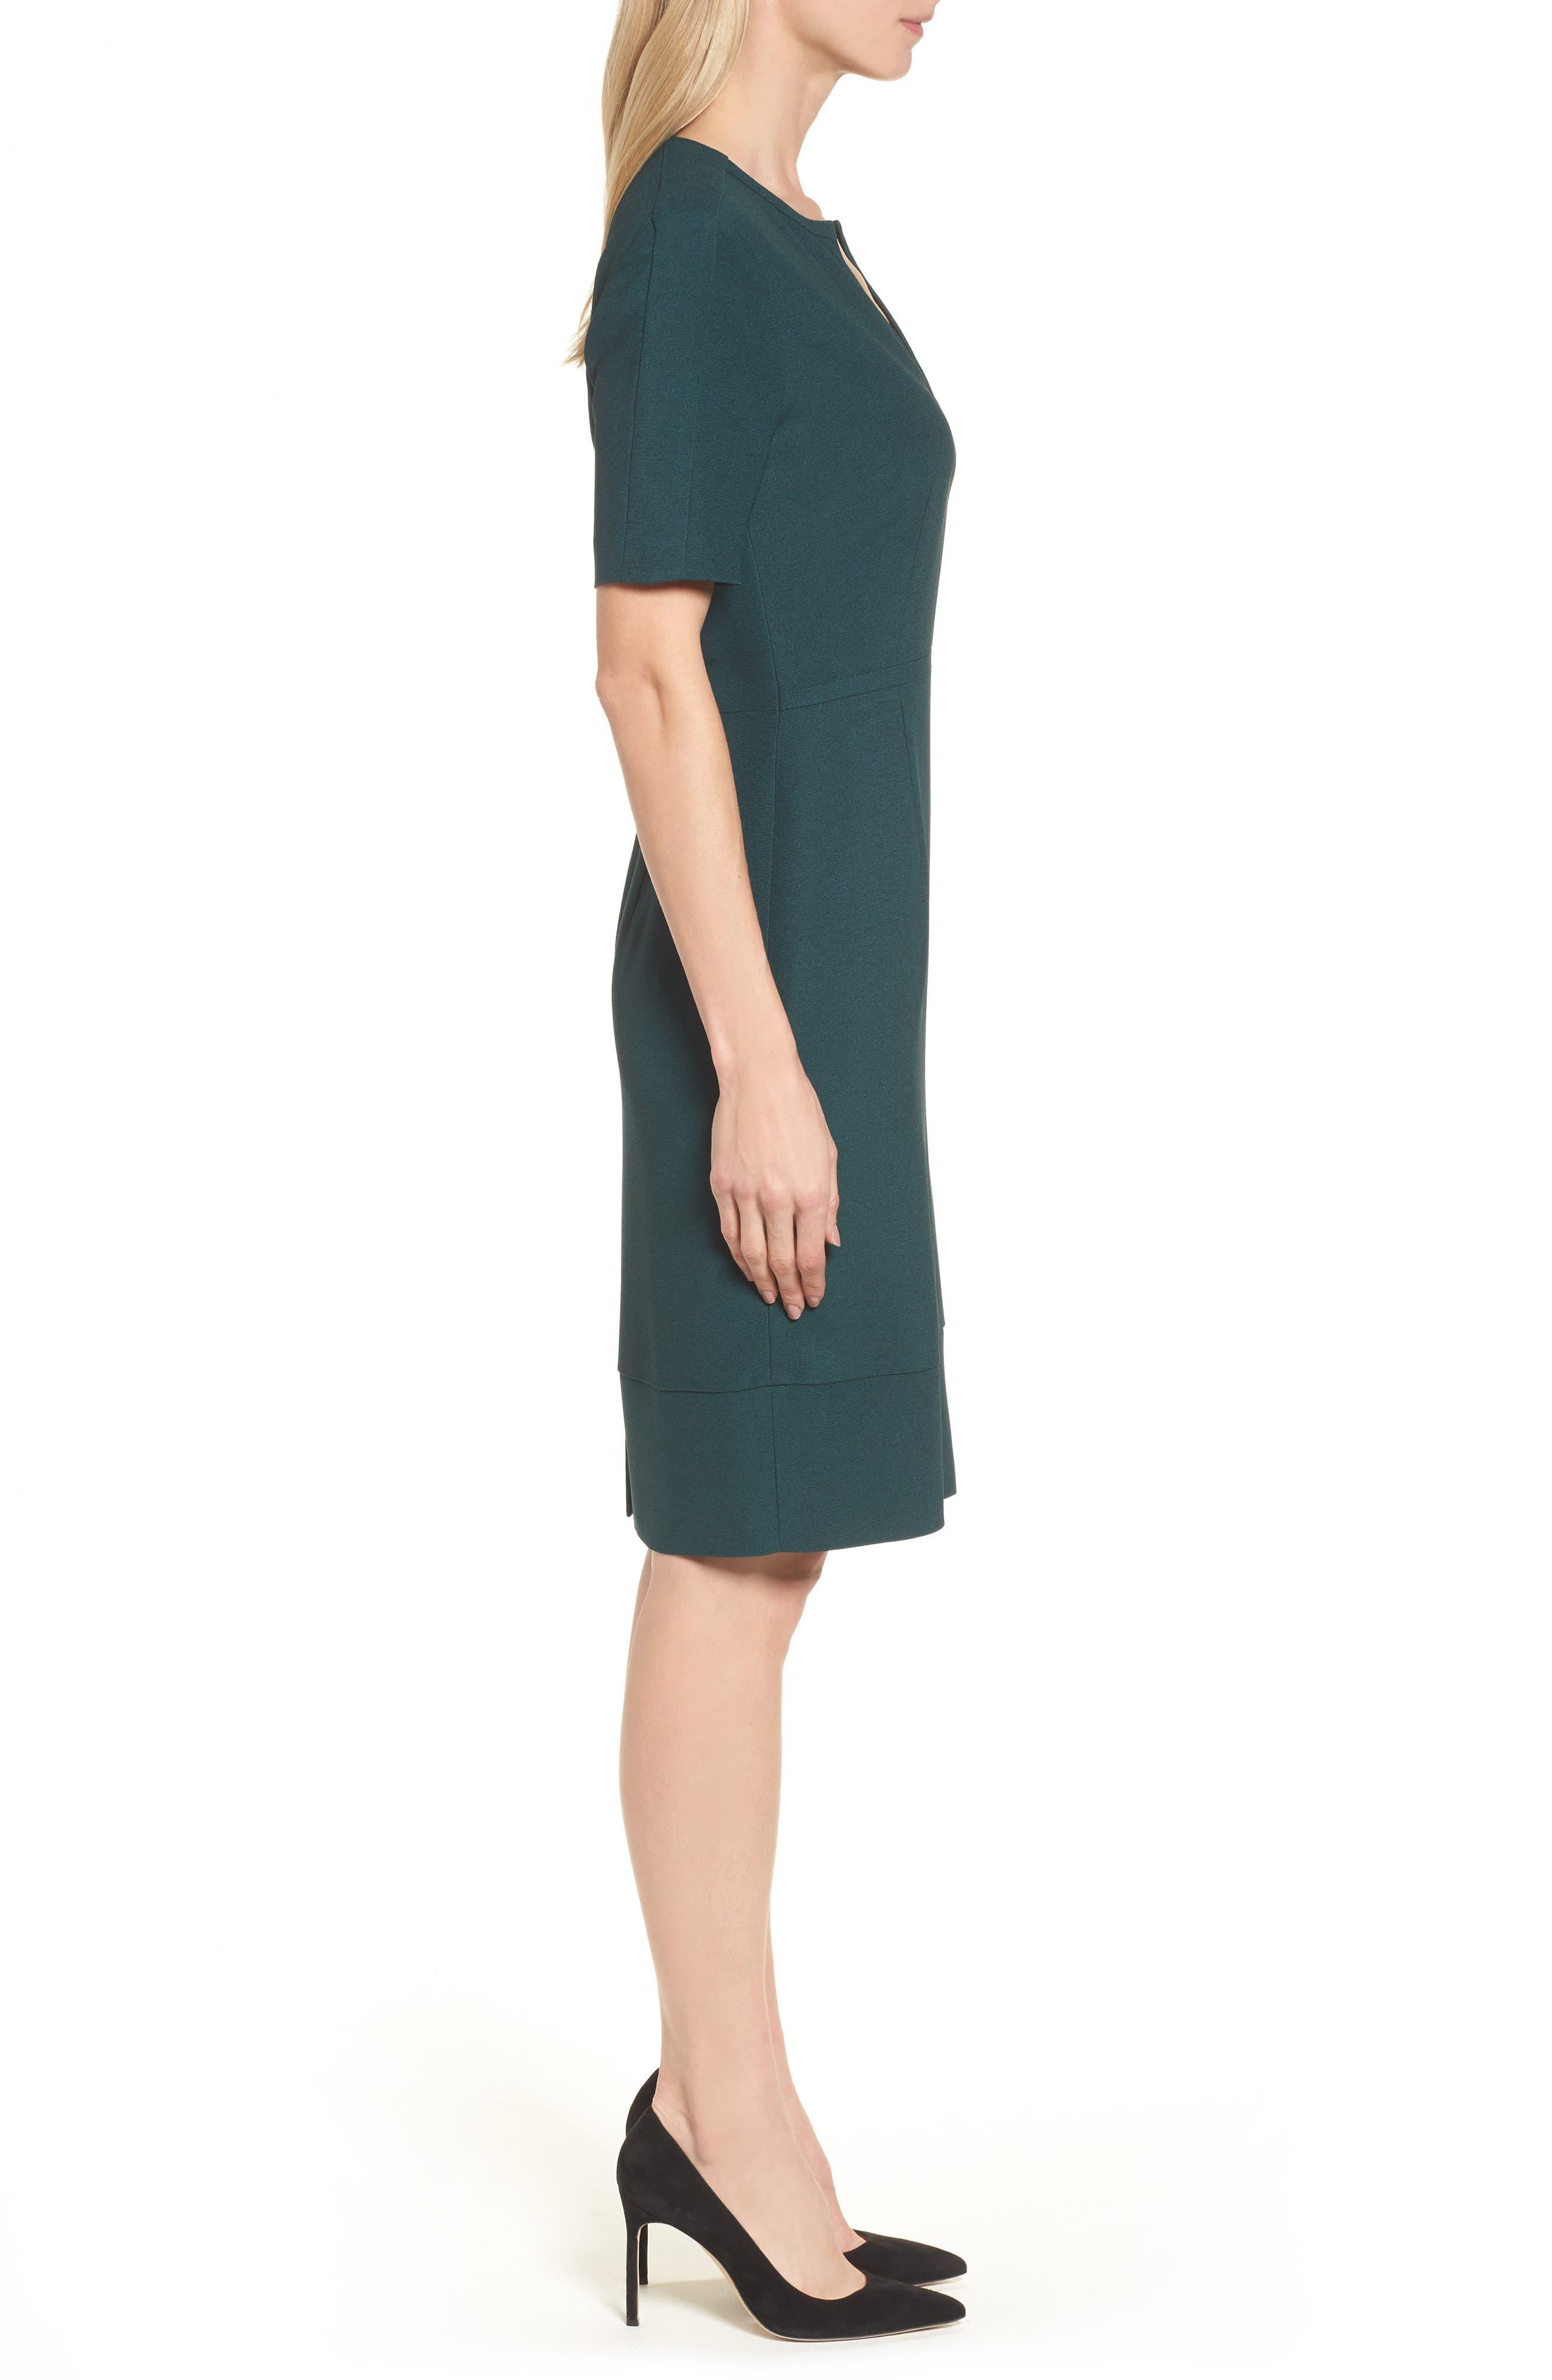 Dalesana Sheath Dress,                             Alternate thumbnail 3, color,                             301